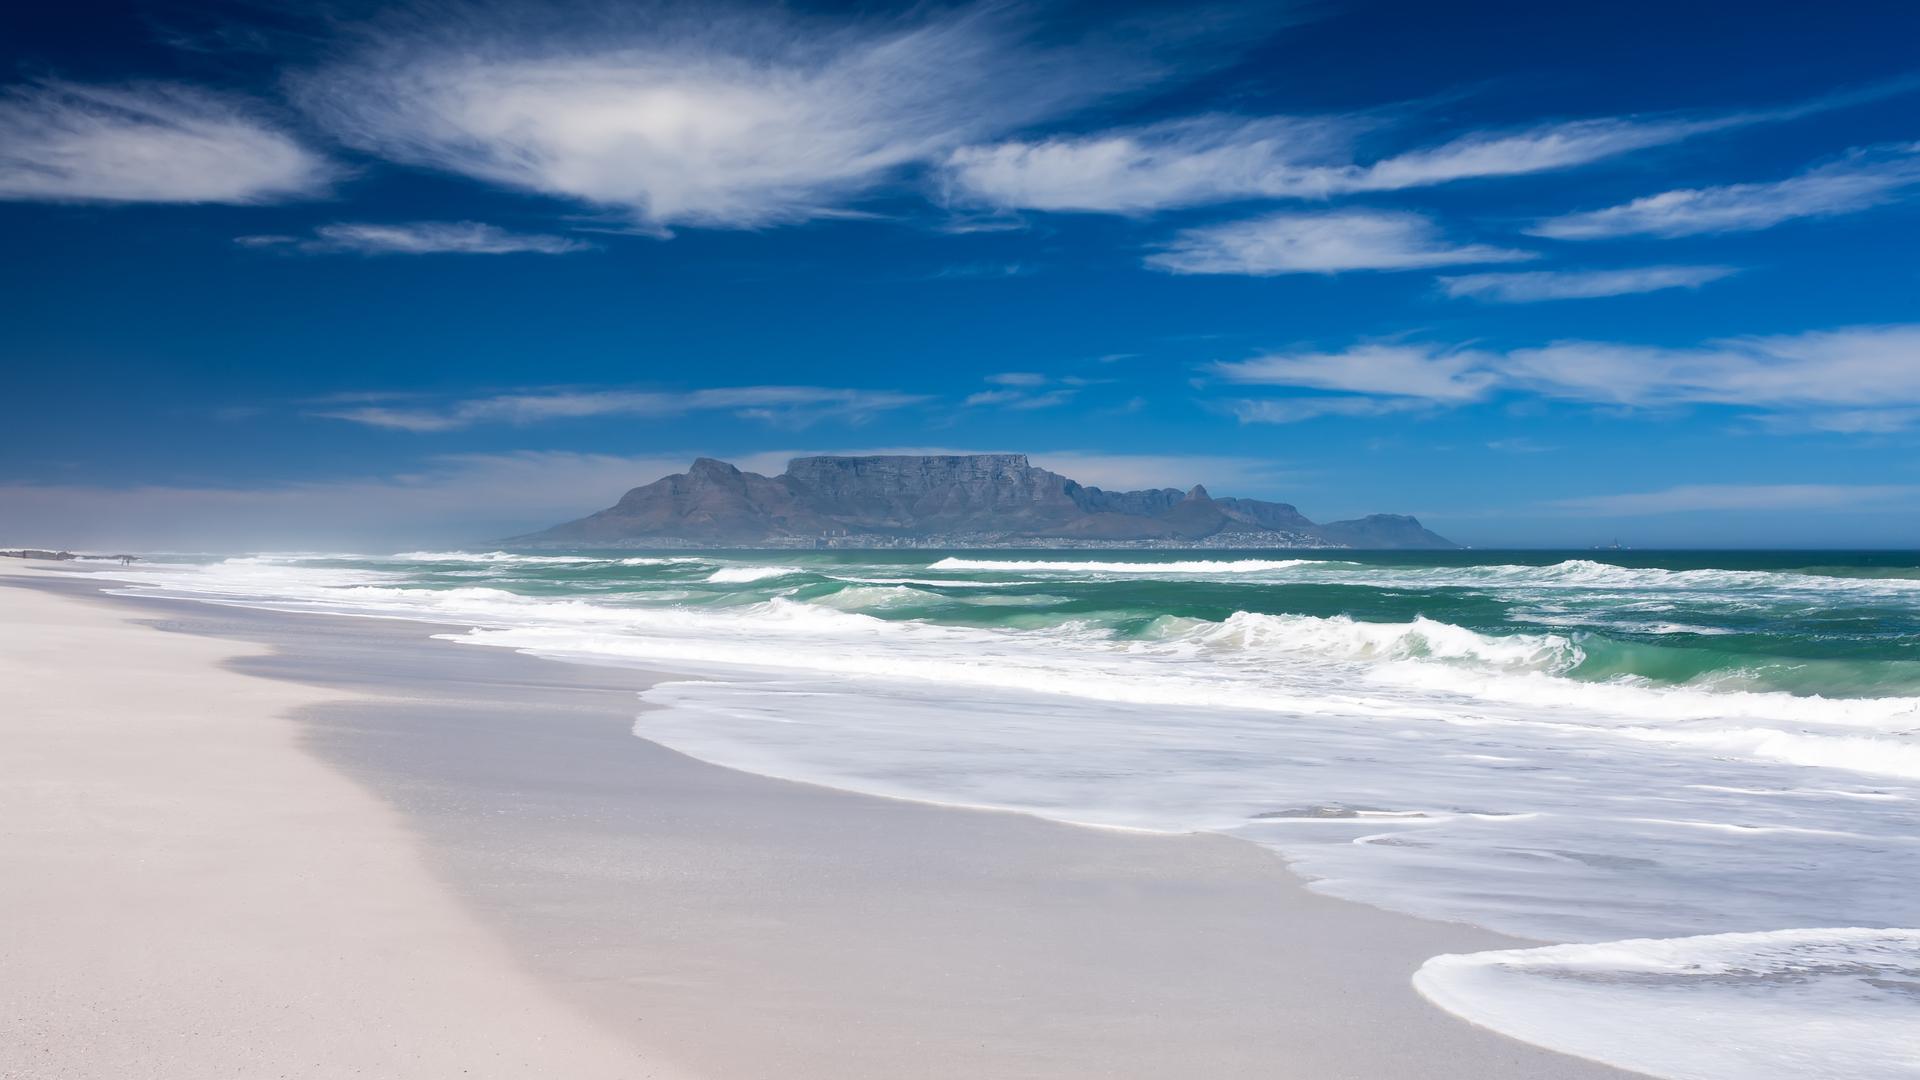 Südafrika | Blick auf den Tafelberg | ©Nolte Lourens/Shutterstock.com